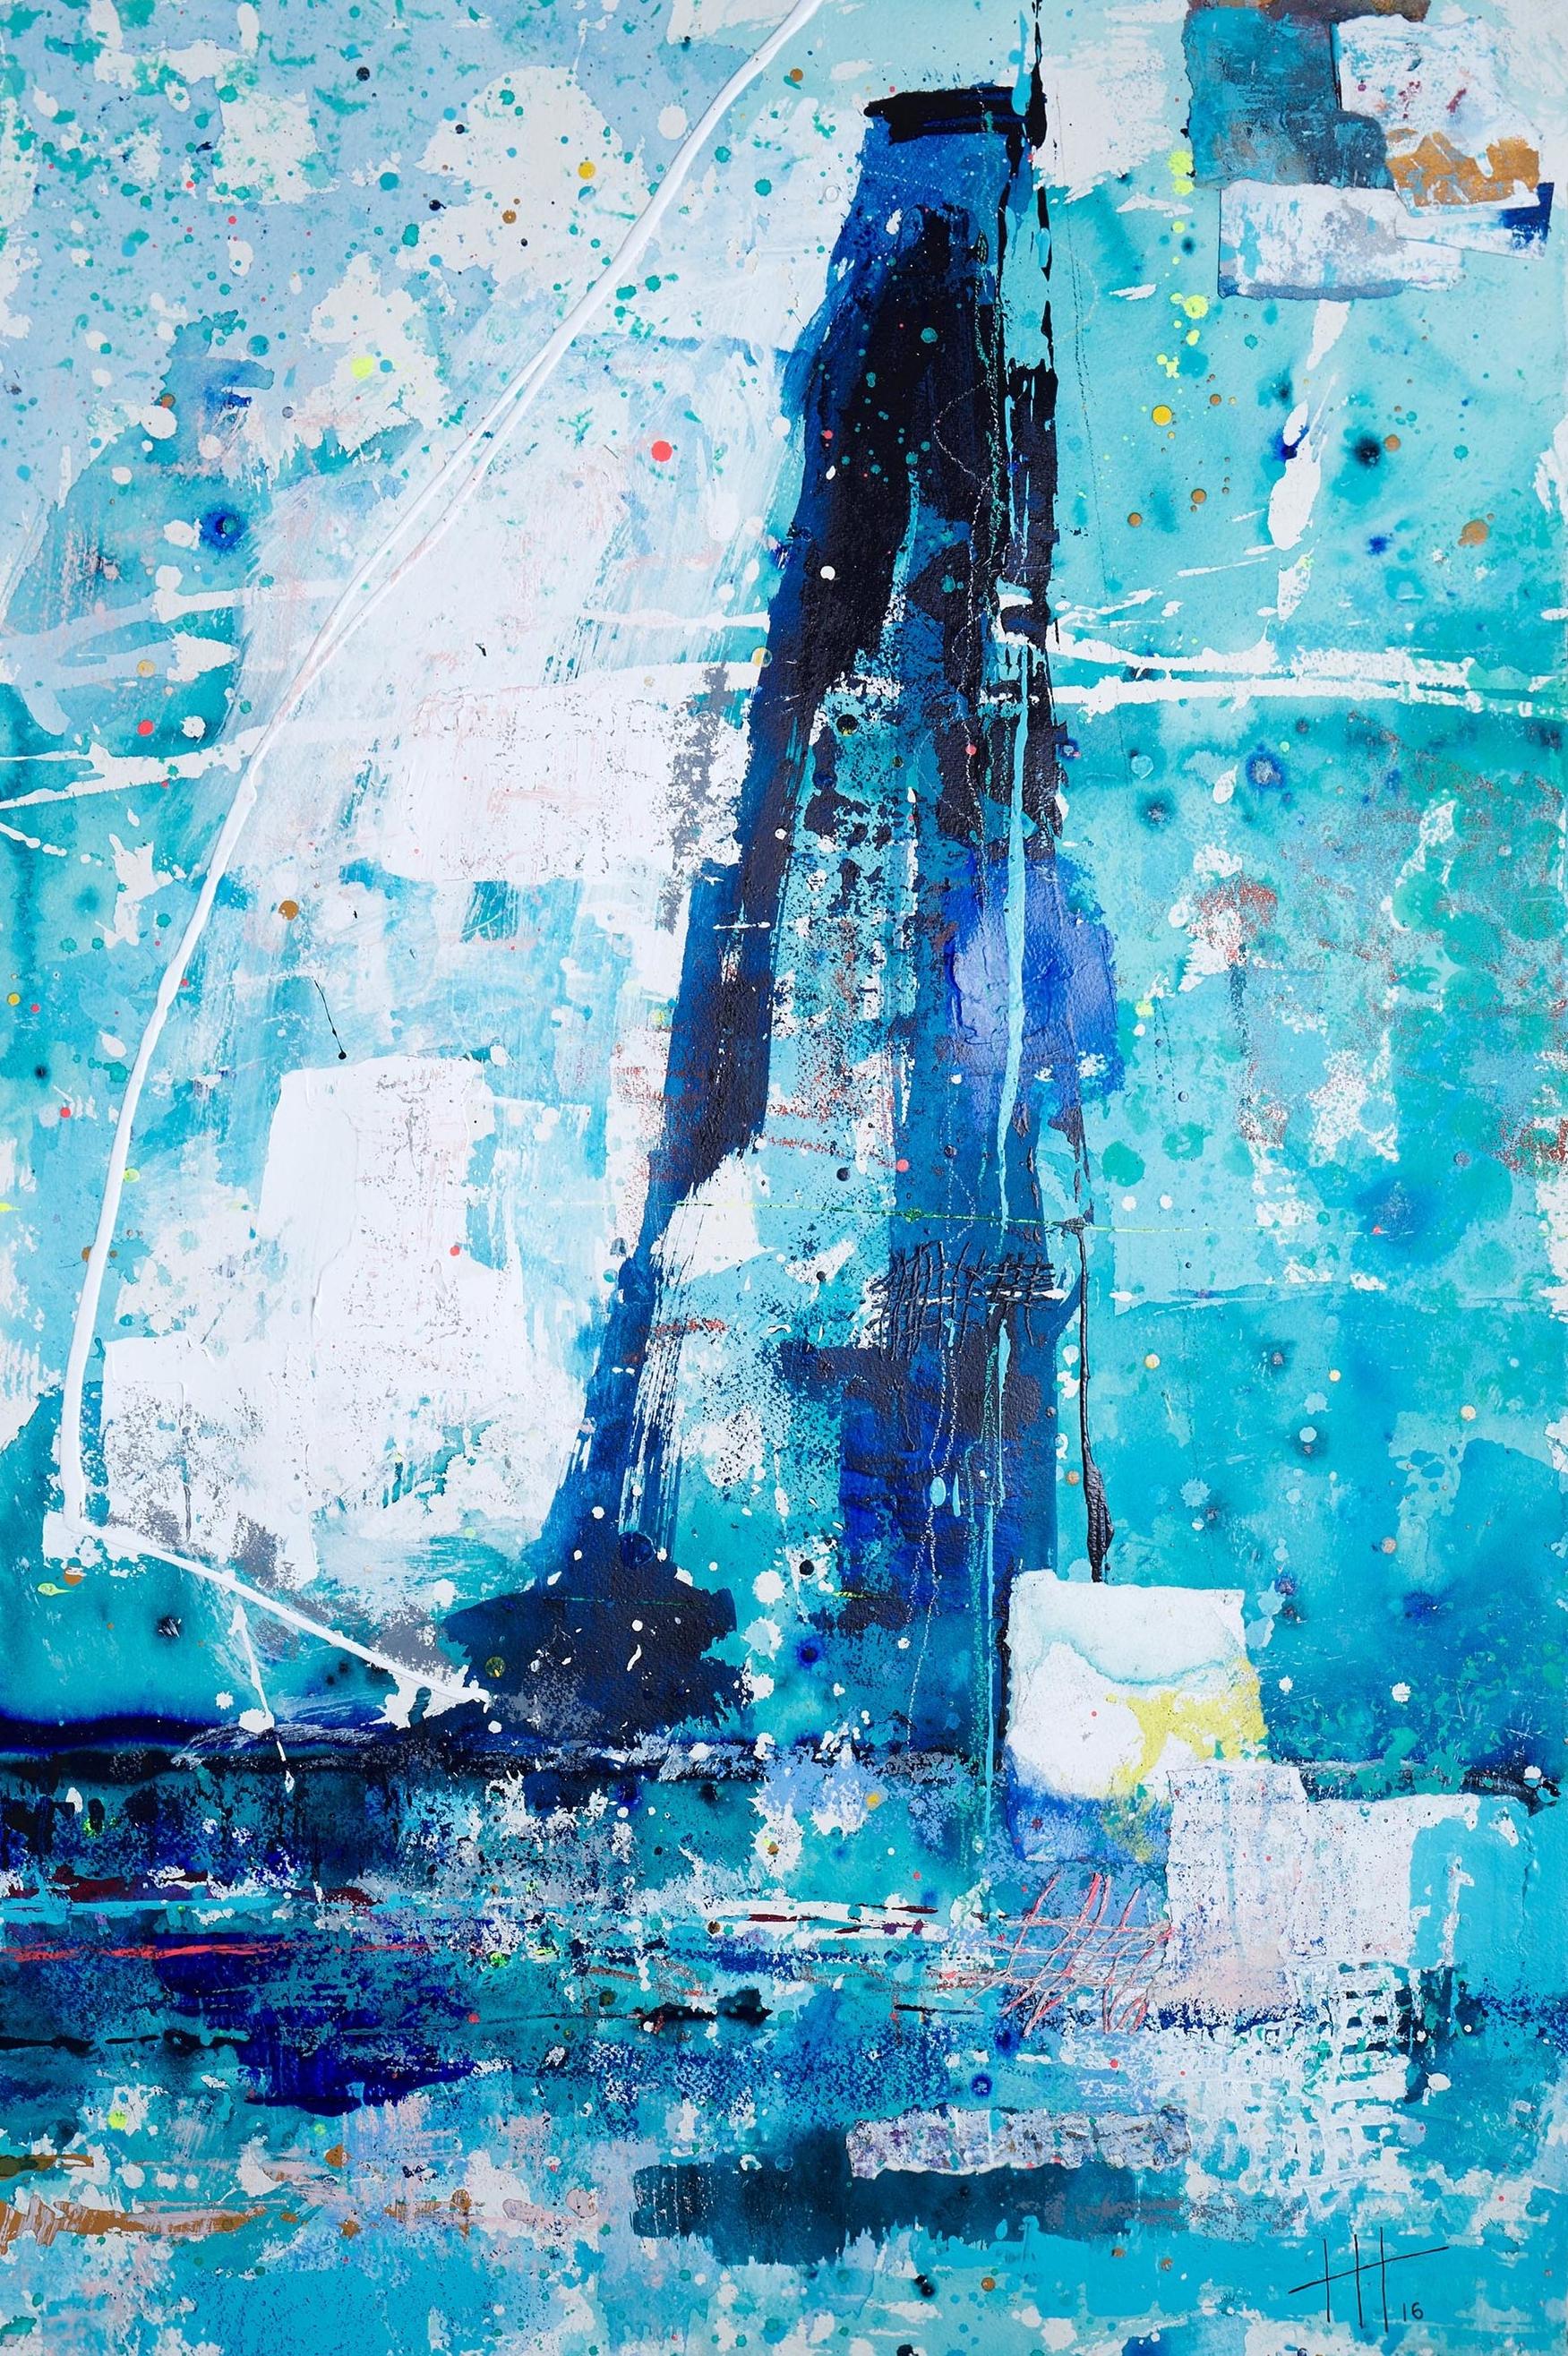 Bespoke Commission Piece Acrylic & Mixed Media / 129cm x 93cm (framed)